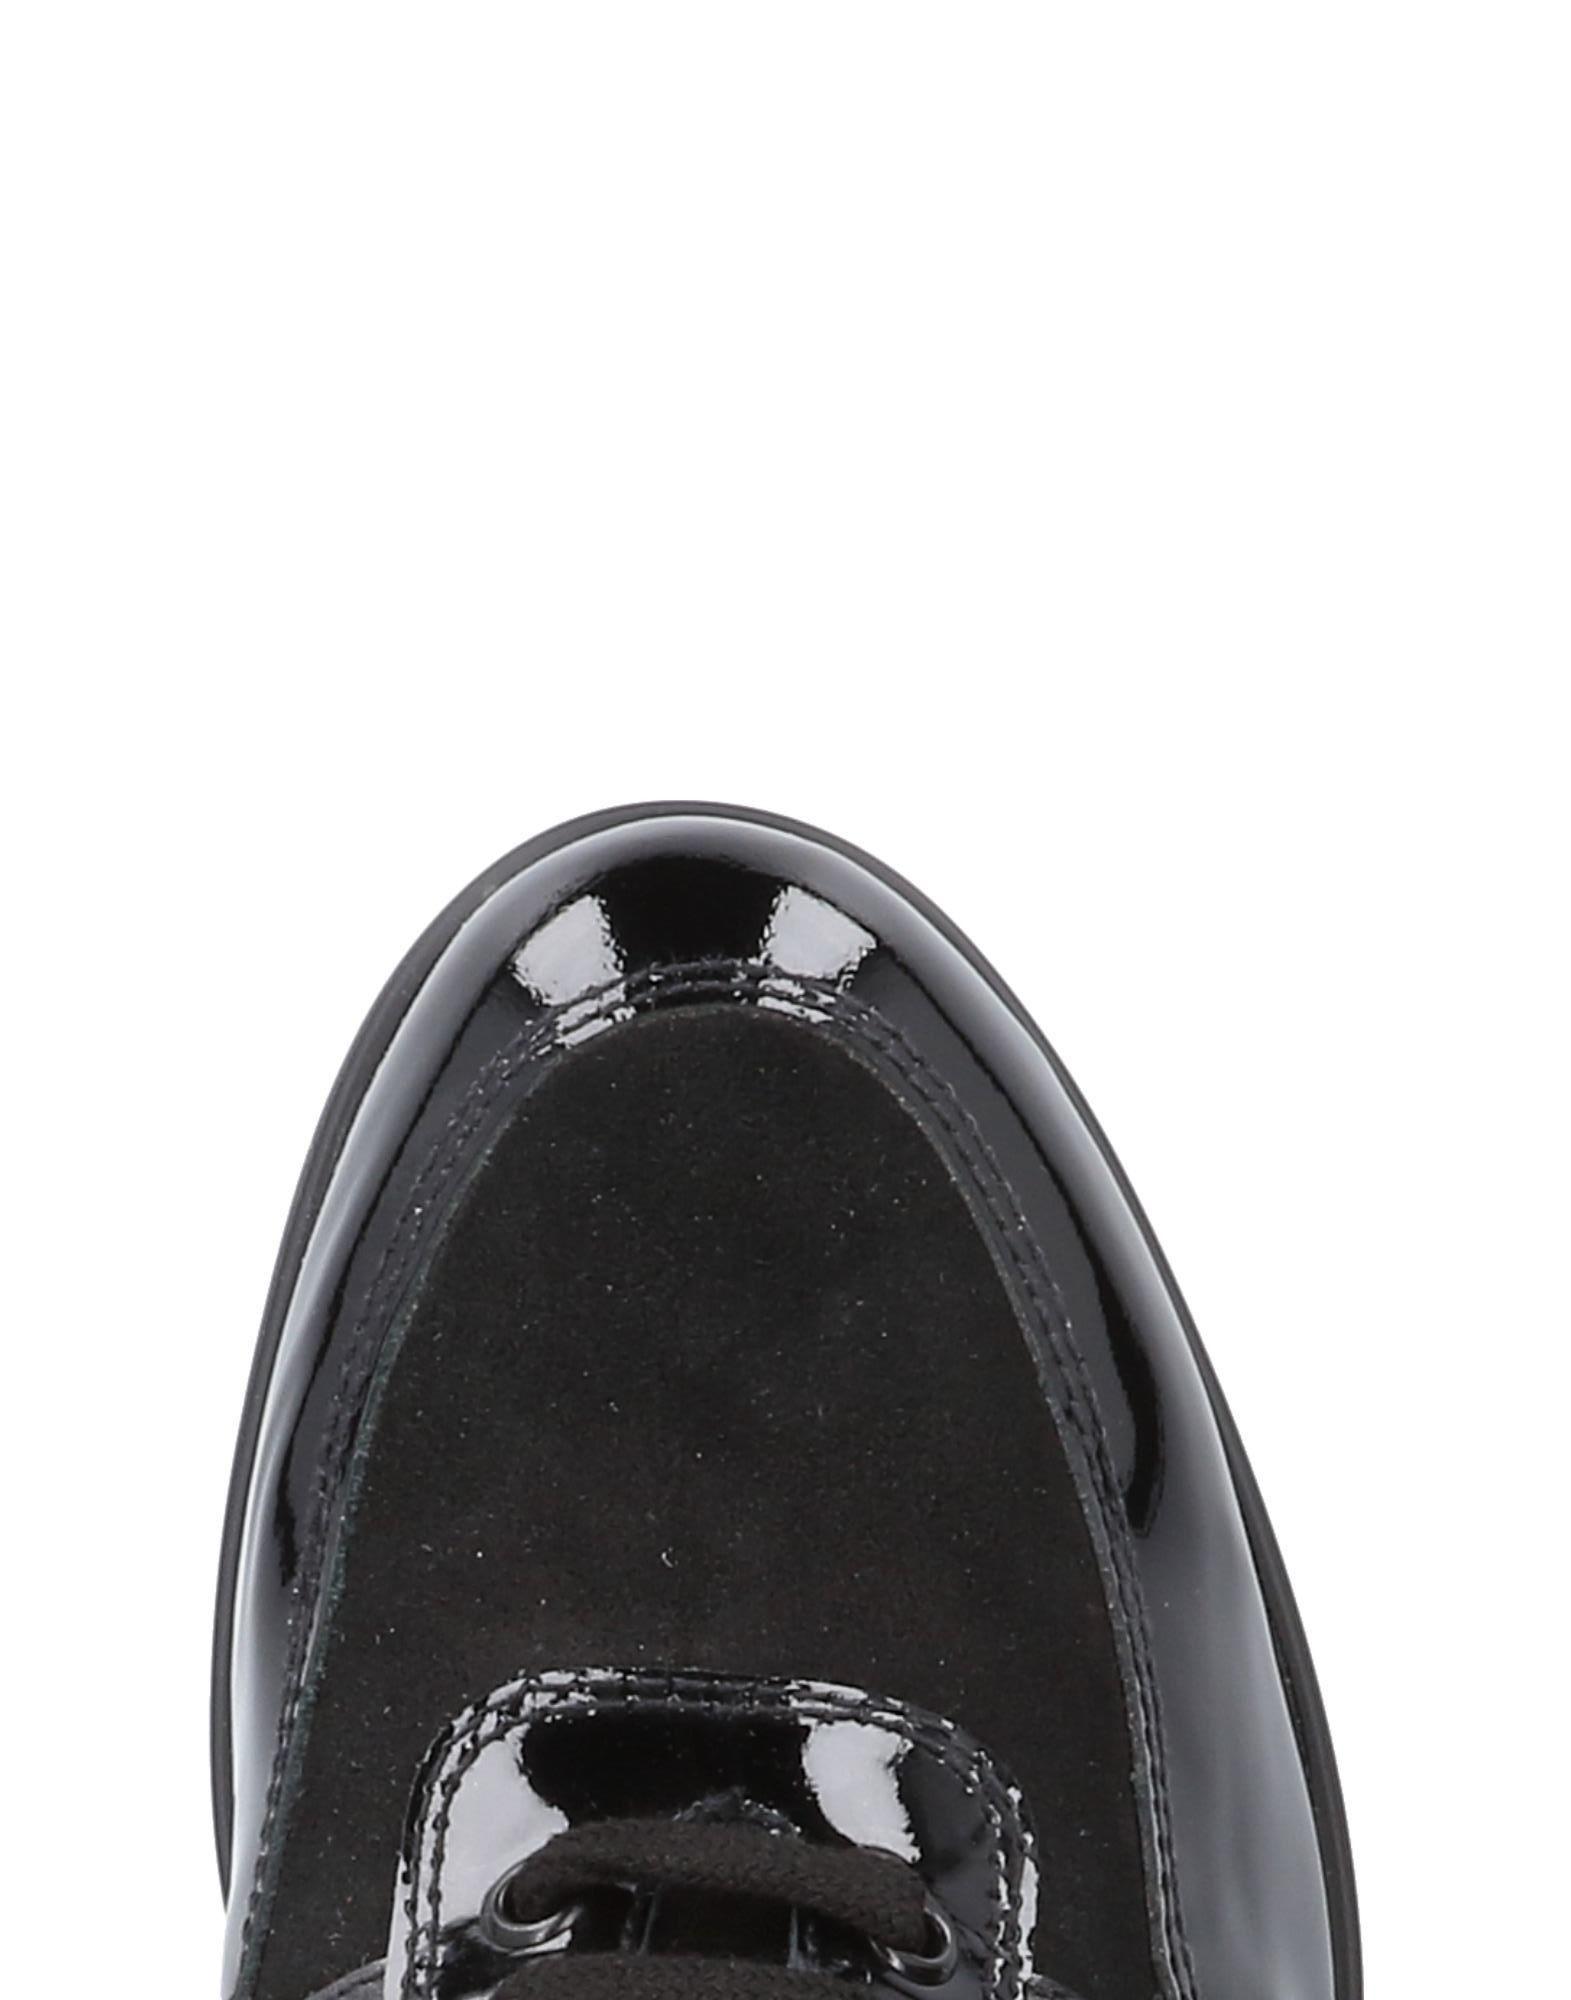 Nero Giardini Sneakers Damen Damen Sneakers  11489093NU Gute Qualität beliebte Schuhe 8daa25